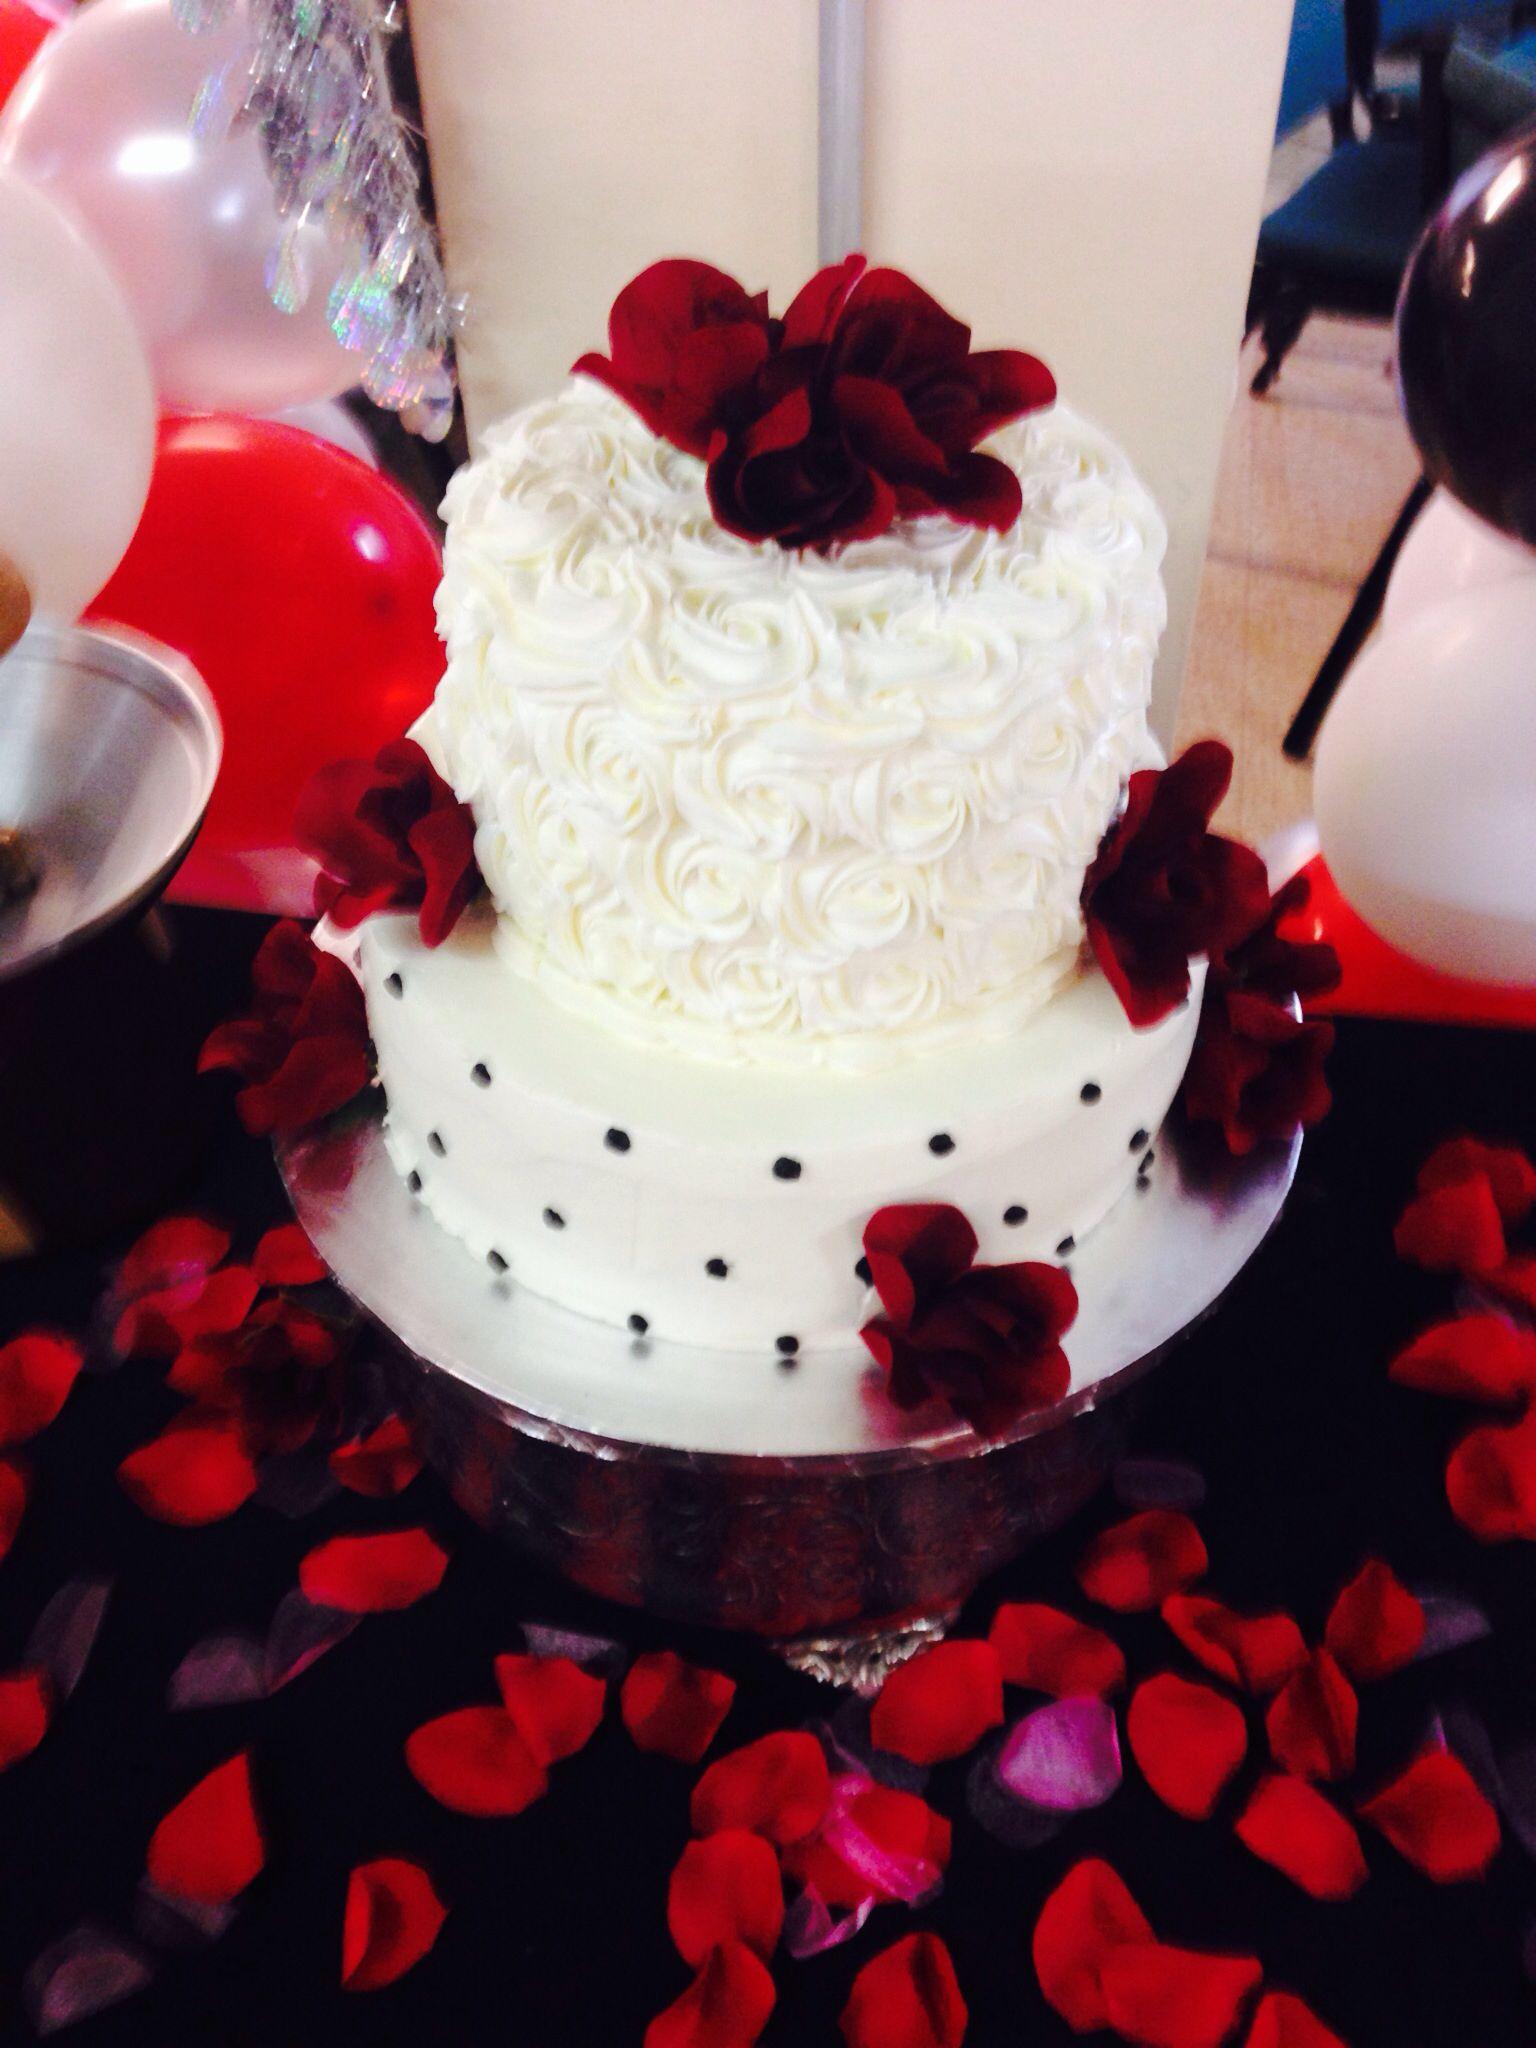 2 Tier Vanilla Wedding Cake Theme Redblackwhite D3 By Linda